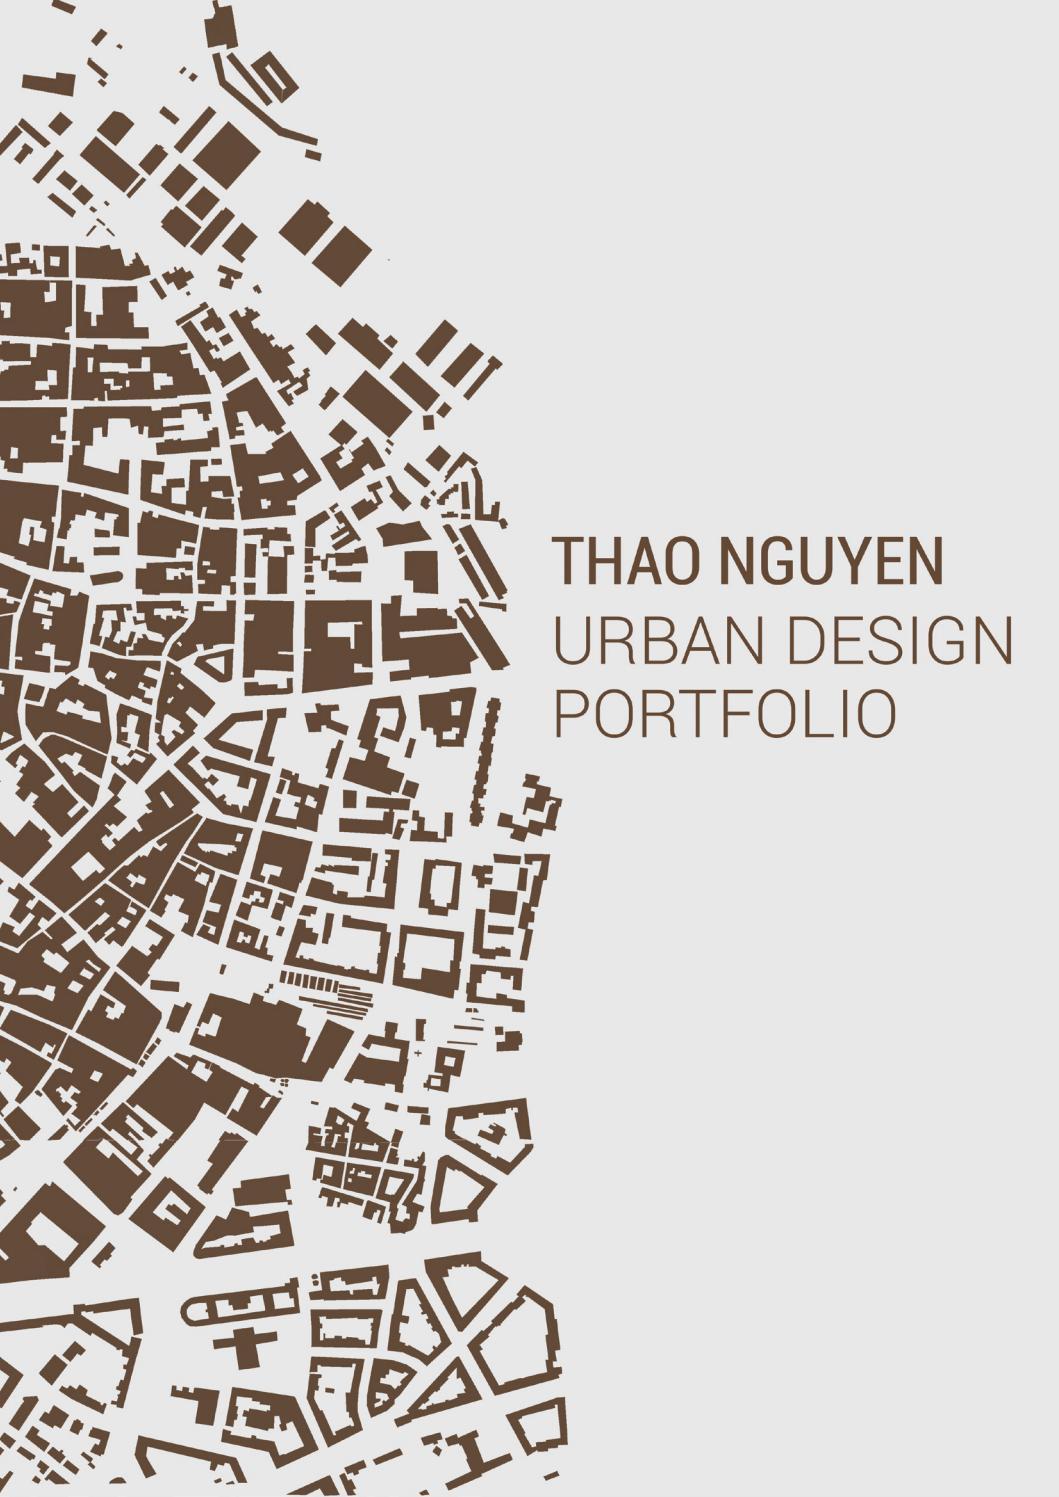 Urban design Portfolio by Vi Tho Nguyn Th  Issuu